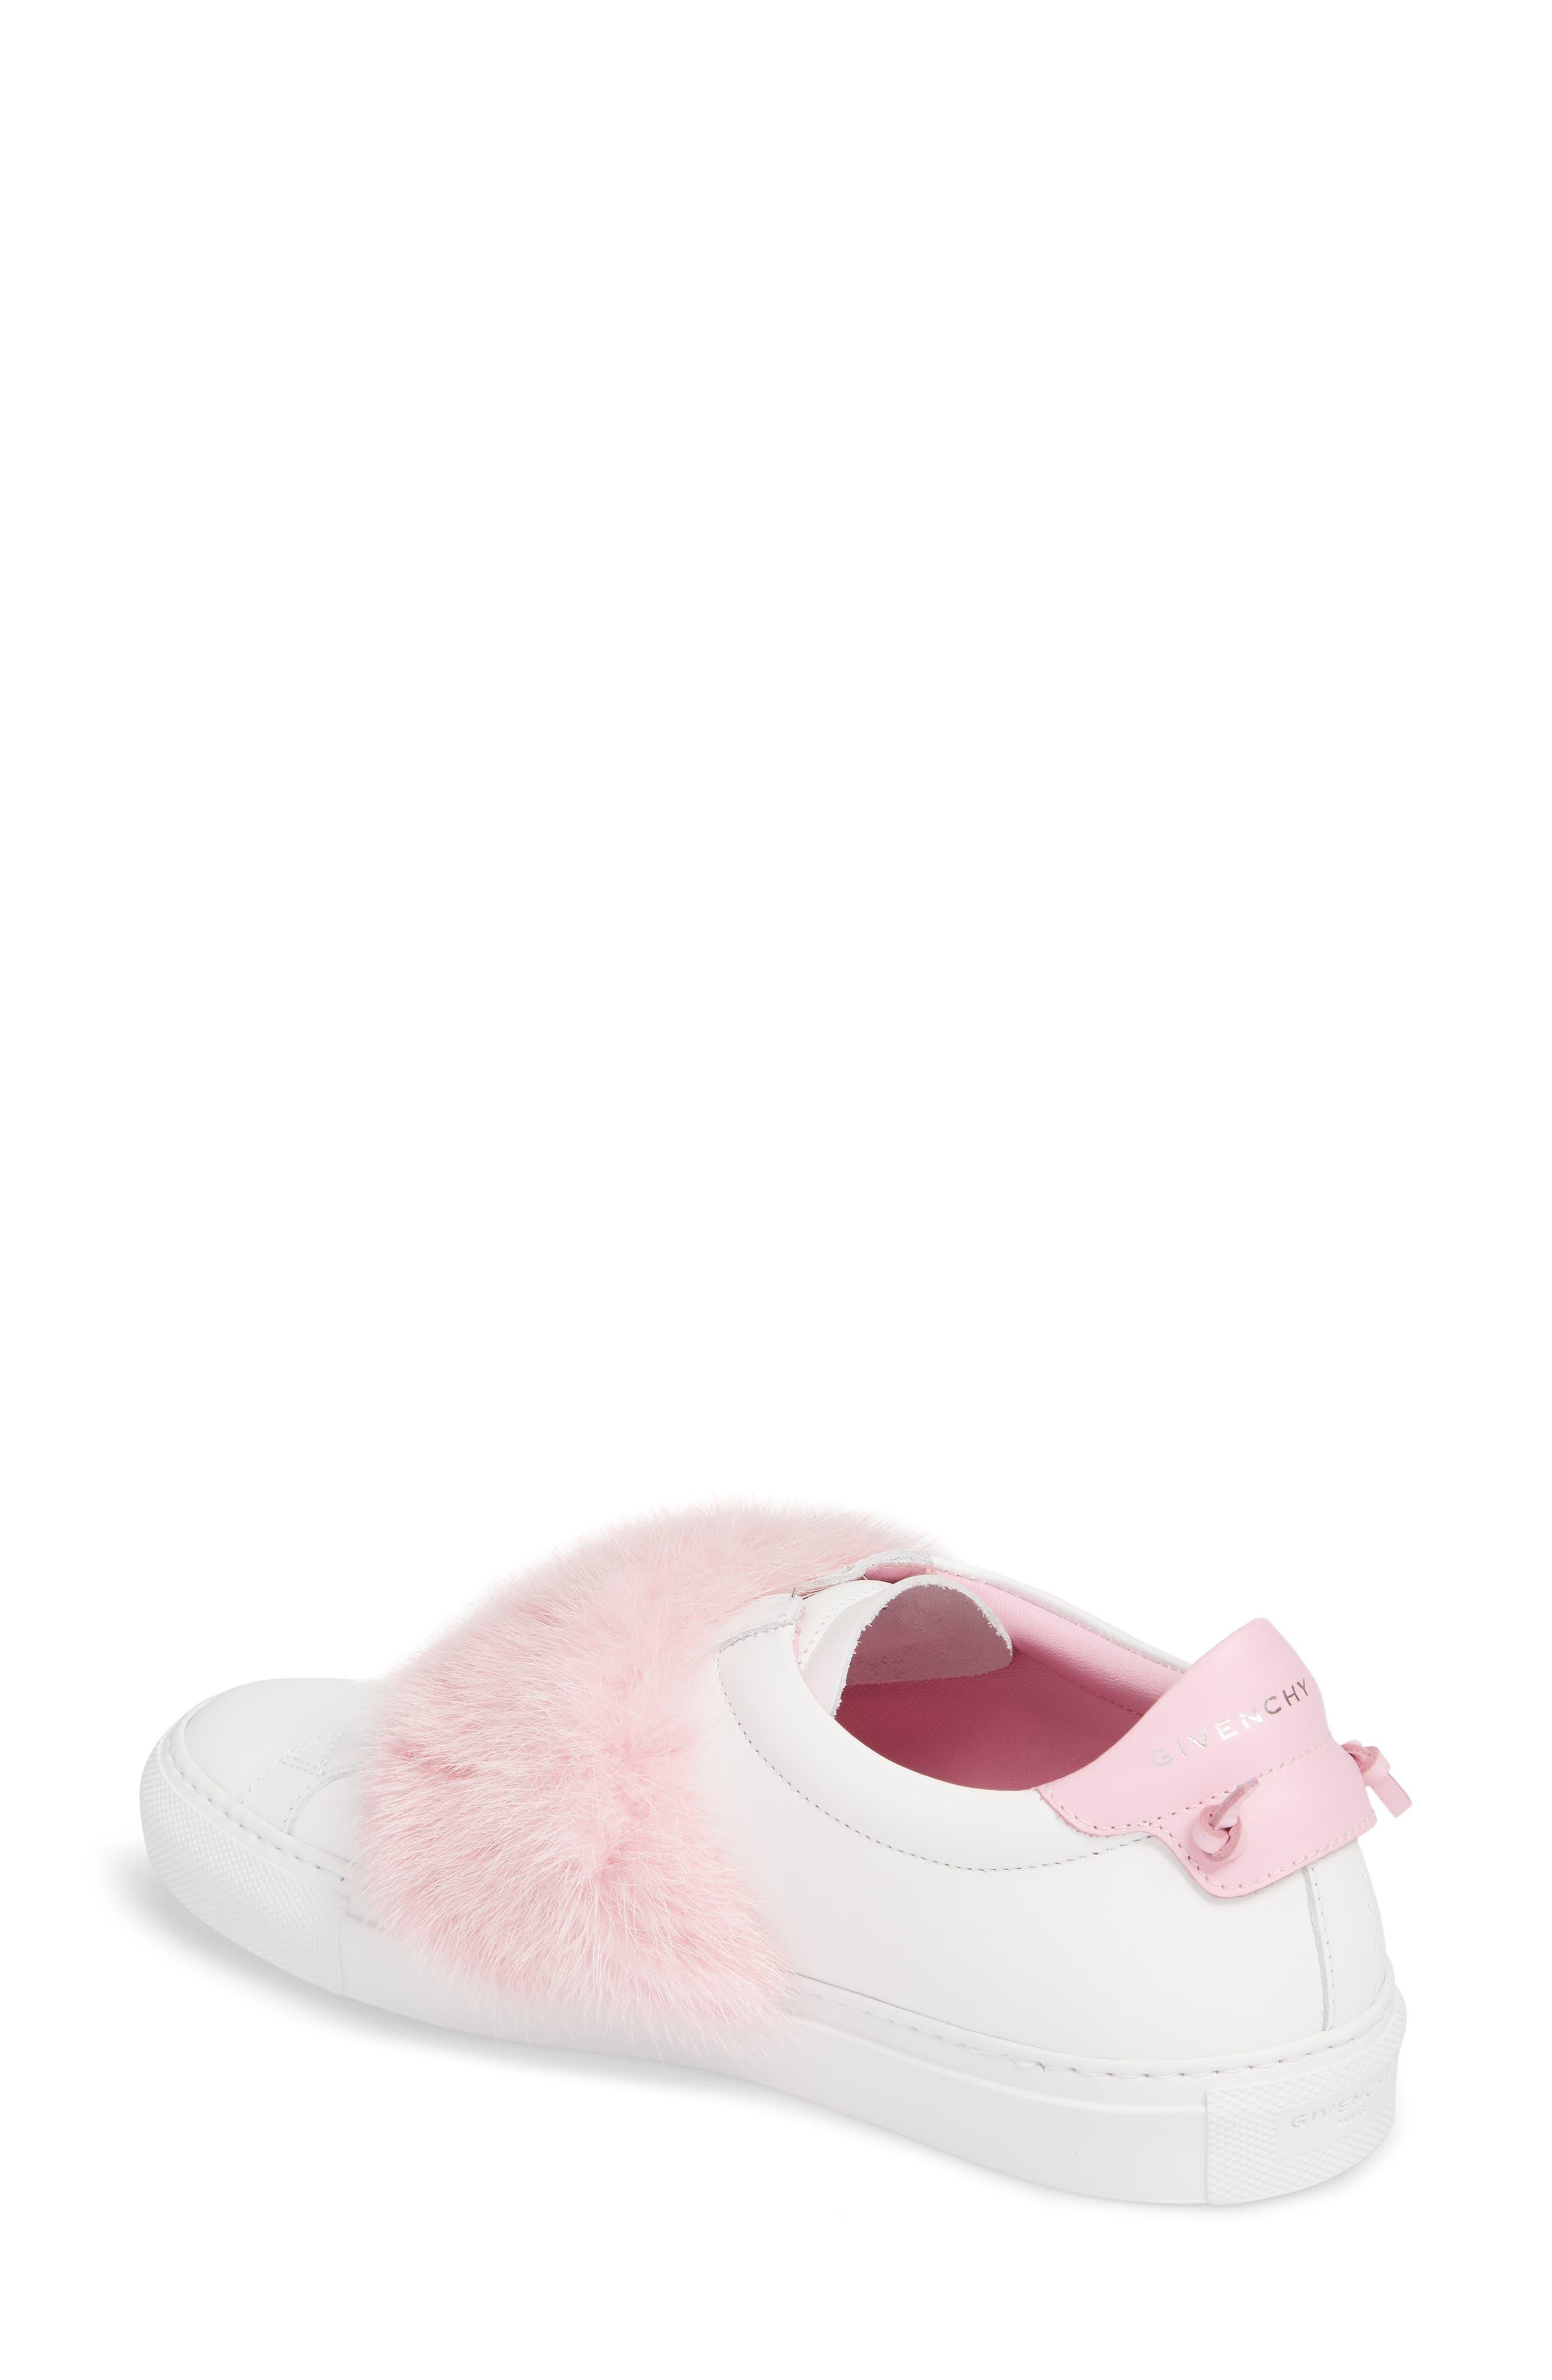 Urban Street Slip-On Sneaker with Genuine Mink Fur Trim,                             Alternate thumbnail 6, color,